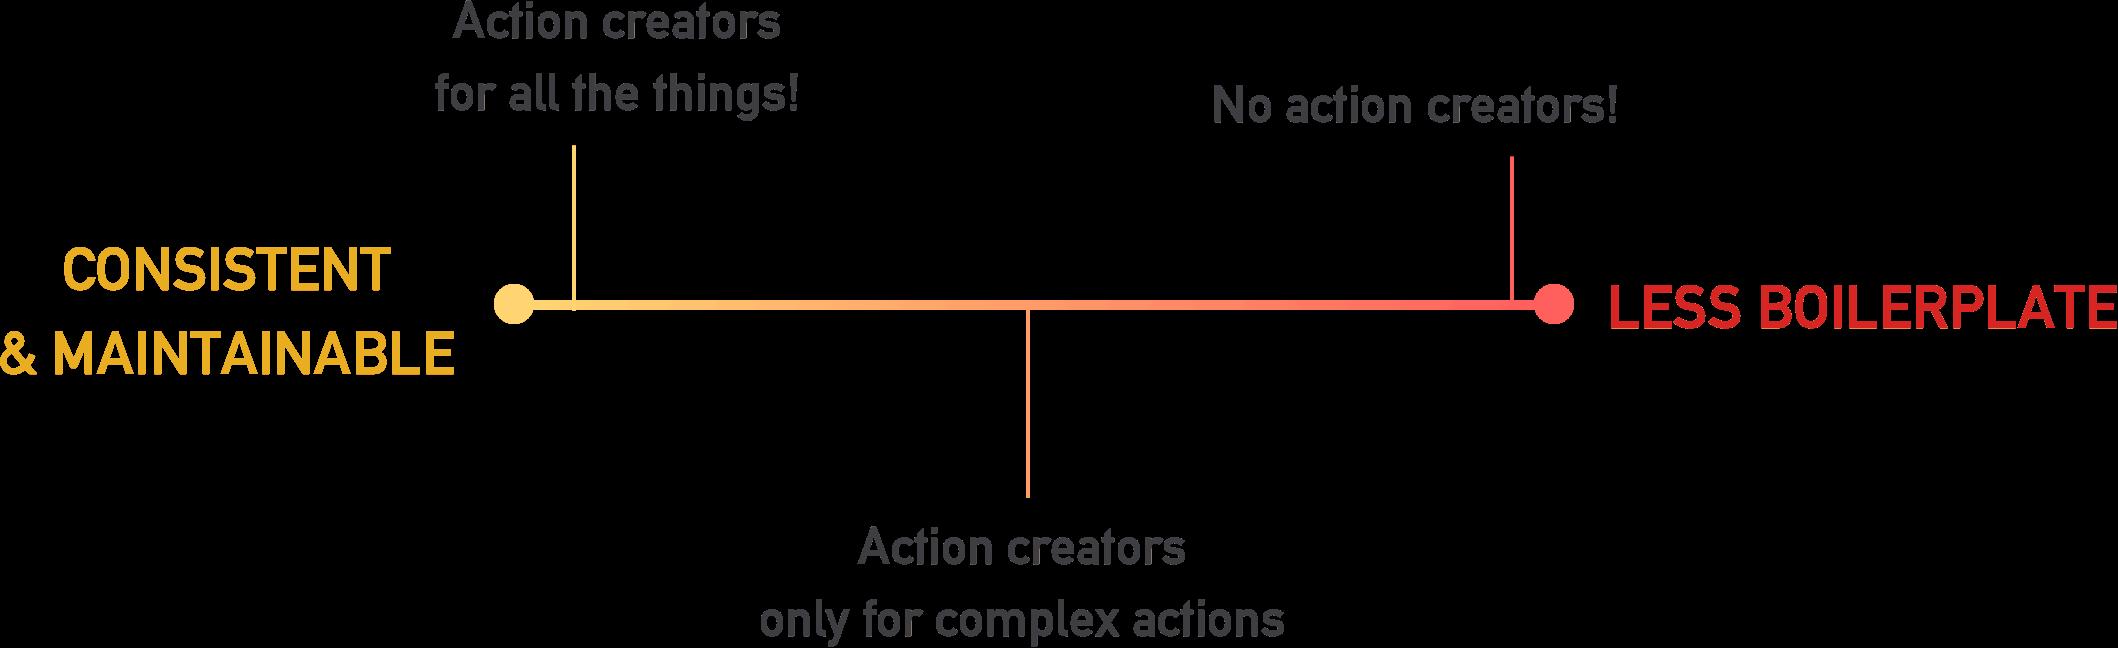 When to Define Action Creators in Redux